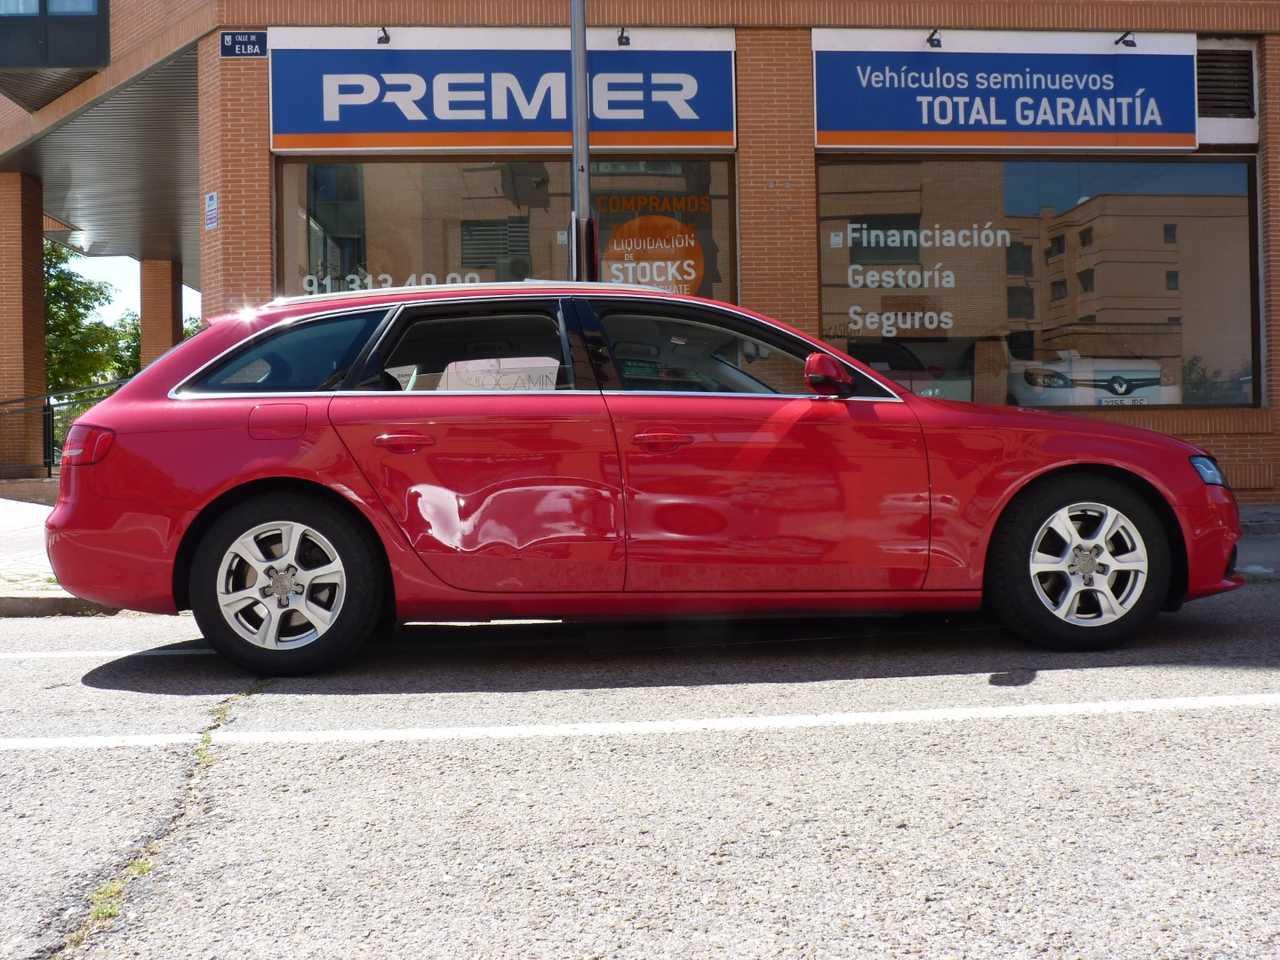 Audi A4 Avant 2.0 TDI 143 CV   - Foto 1